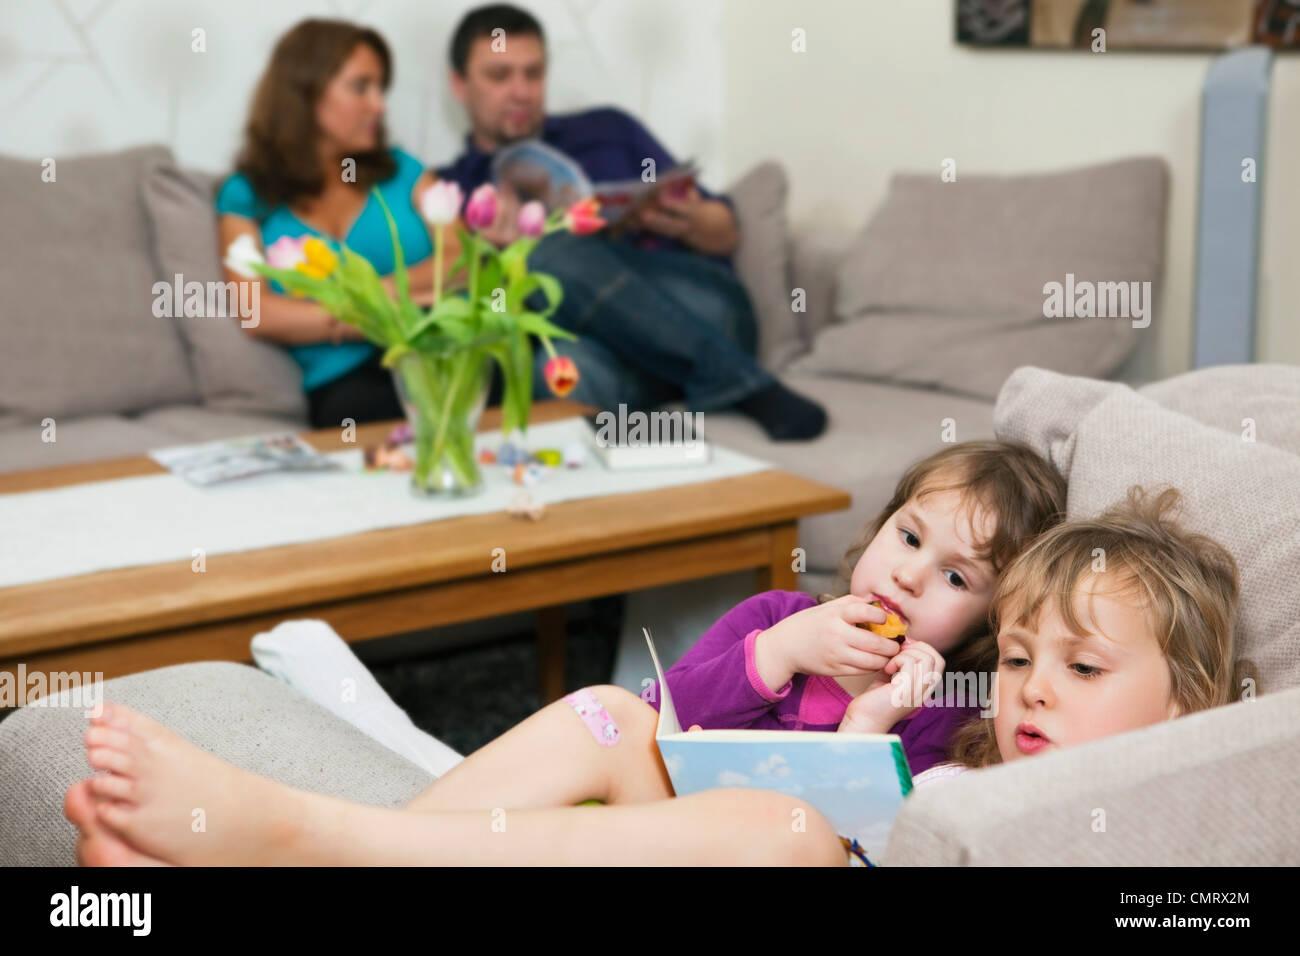 Family in livingroom - Stock Image